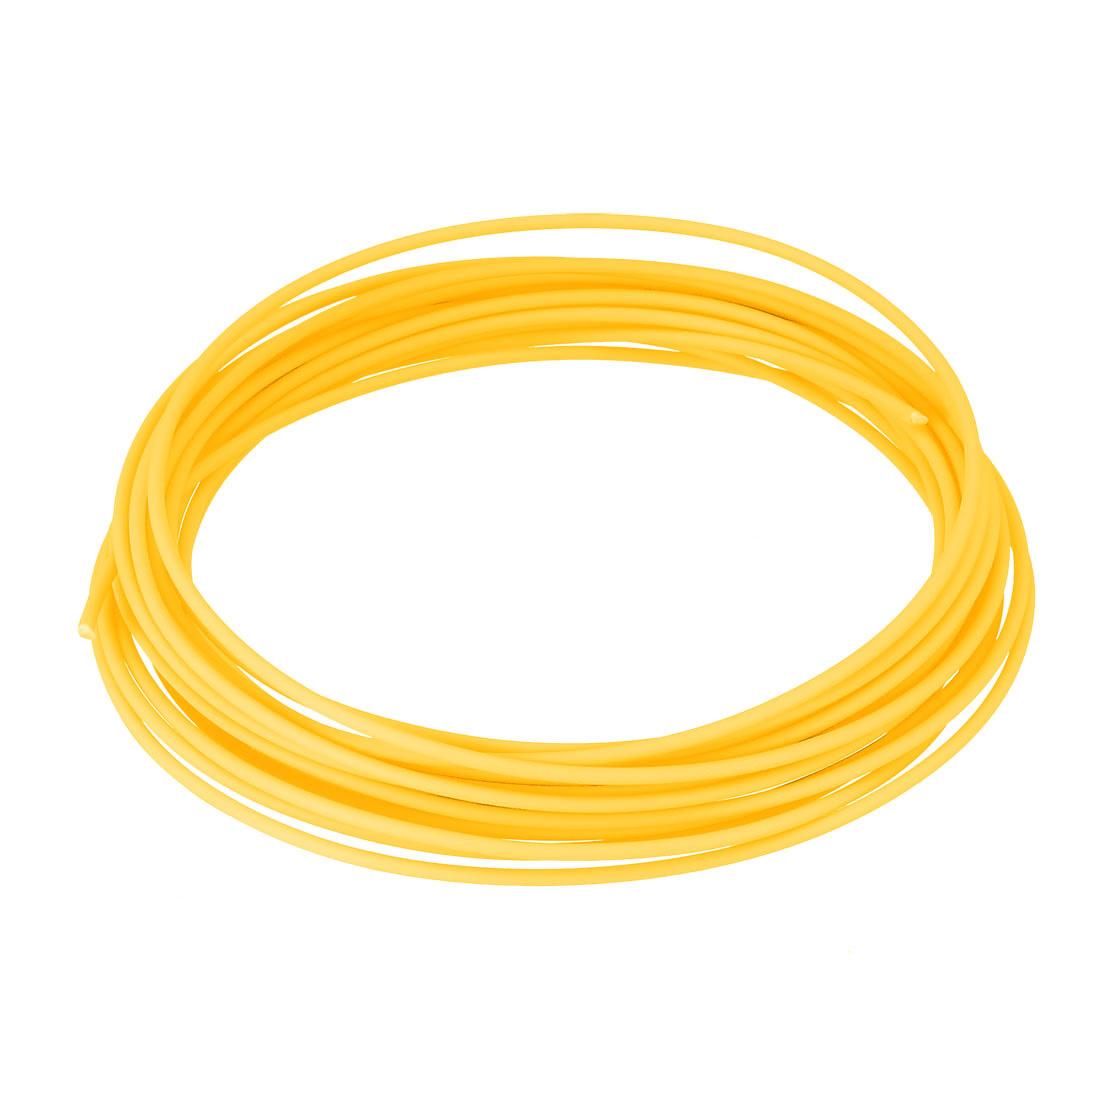 5 Meter/16 Ft PCL 3D Pen/3D Printer Filament, 1.75 mm Yellow